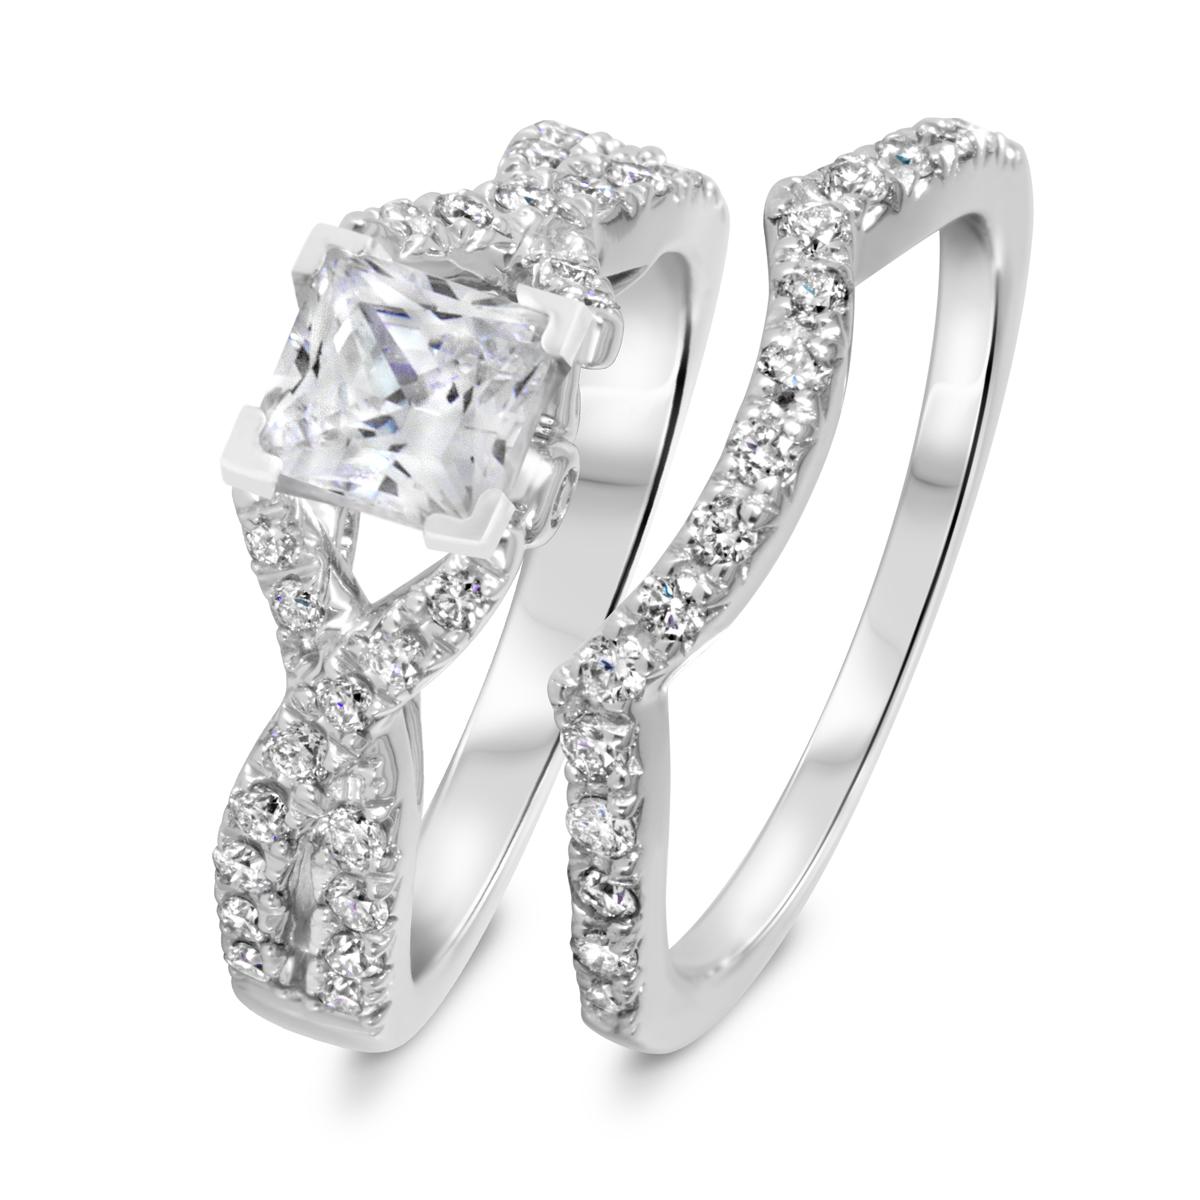 1 3/4 CT. T.W. Diamond Women's Bridal Wedding Ring Set 10K White Gold